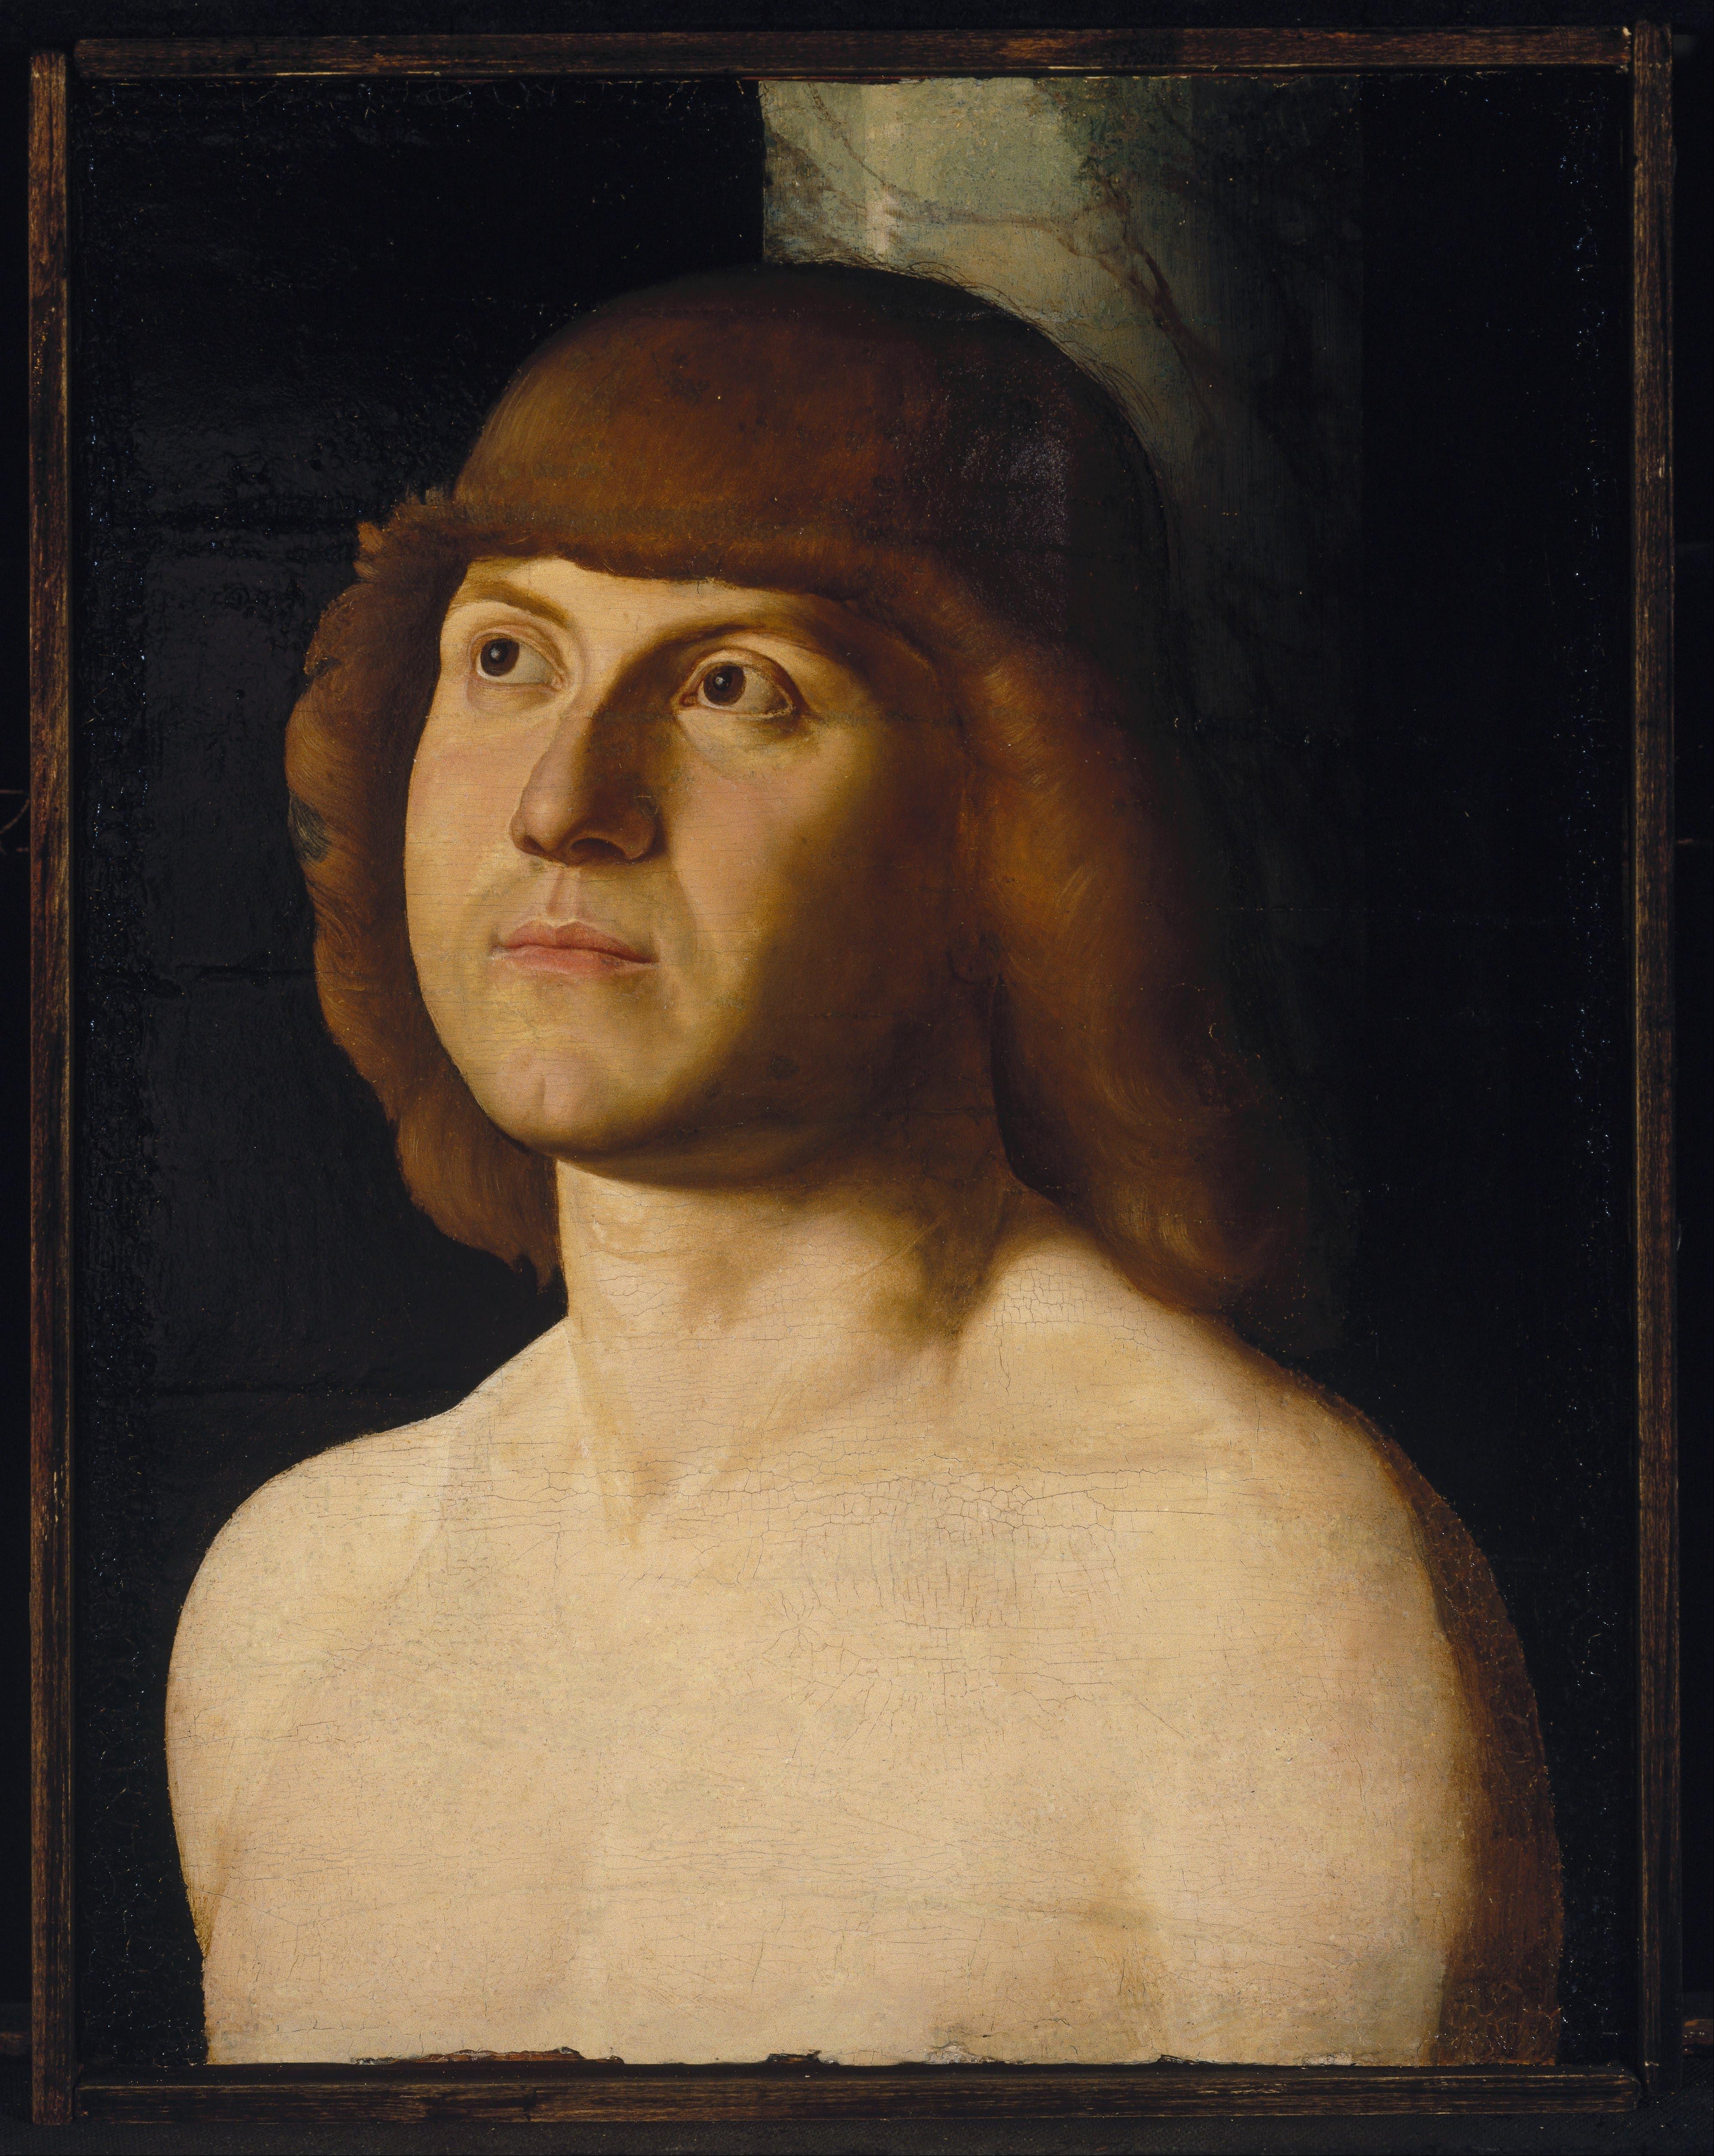 Antonello da Messina st Sebastian of Antonello da Messina